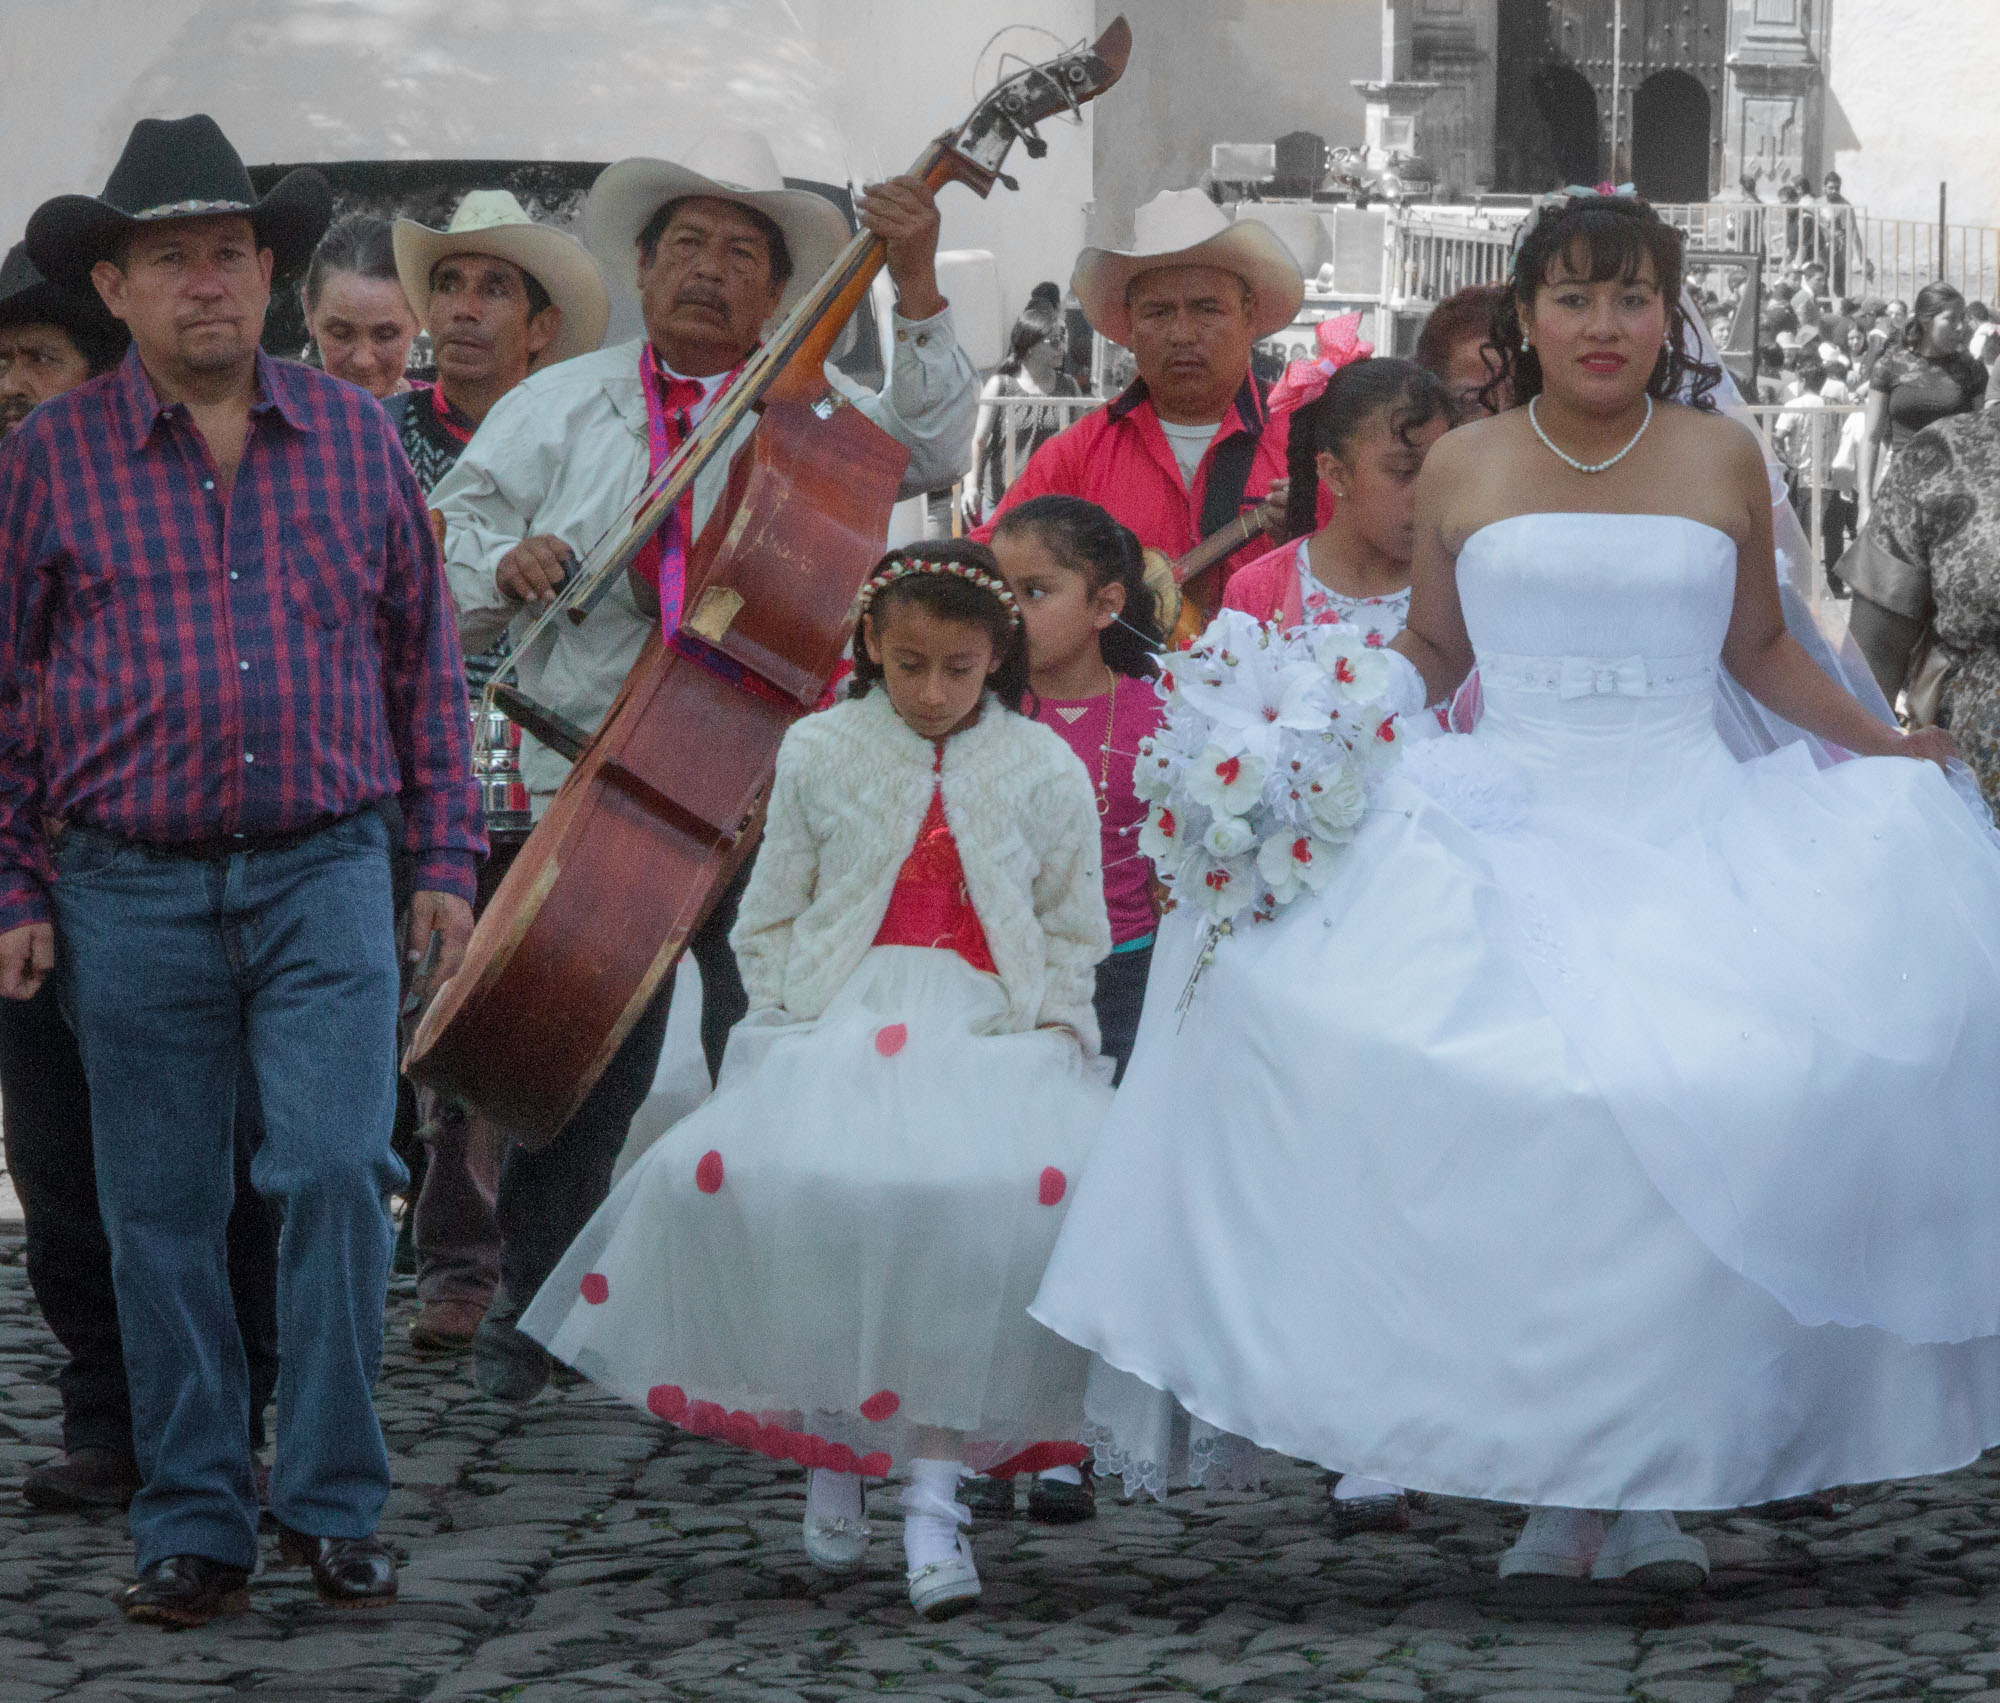 All About That Bass   CantoyaFest: Pátzcuaro, Michoacán, Mexico — Saturday, July 22, 2017